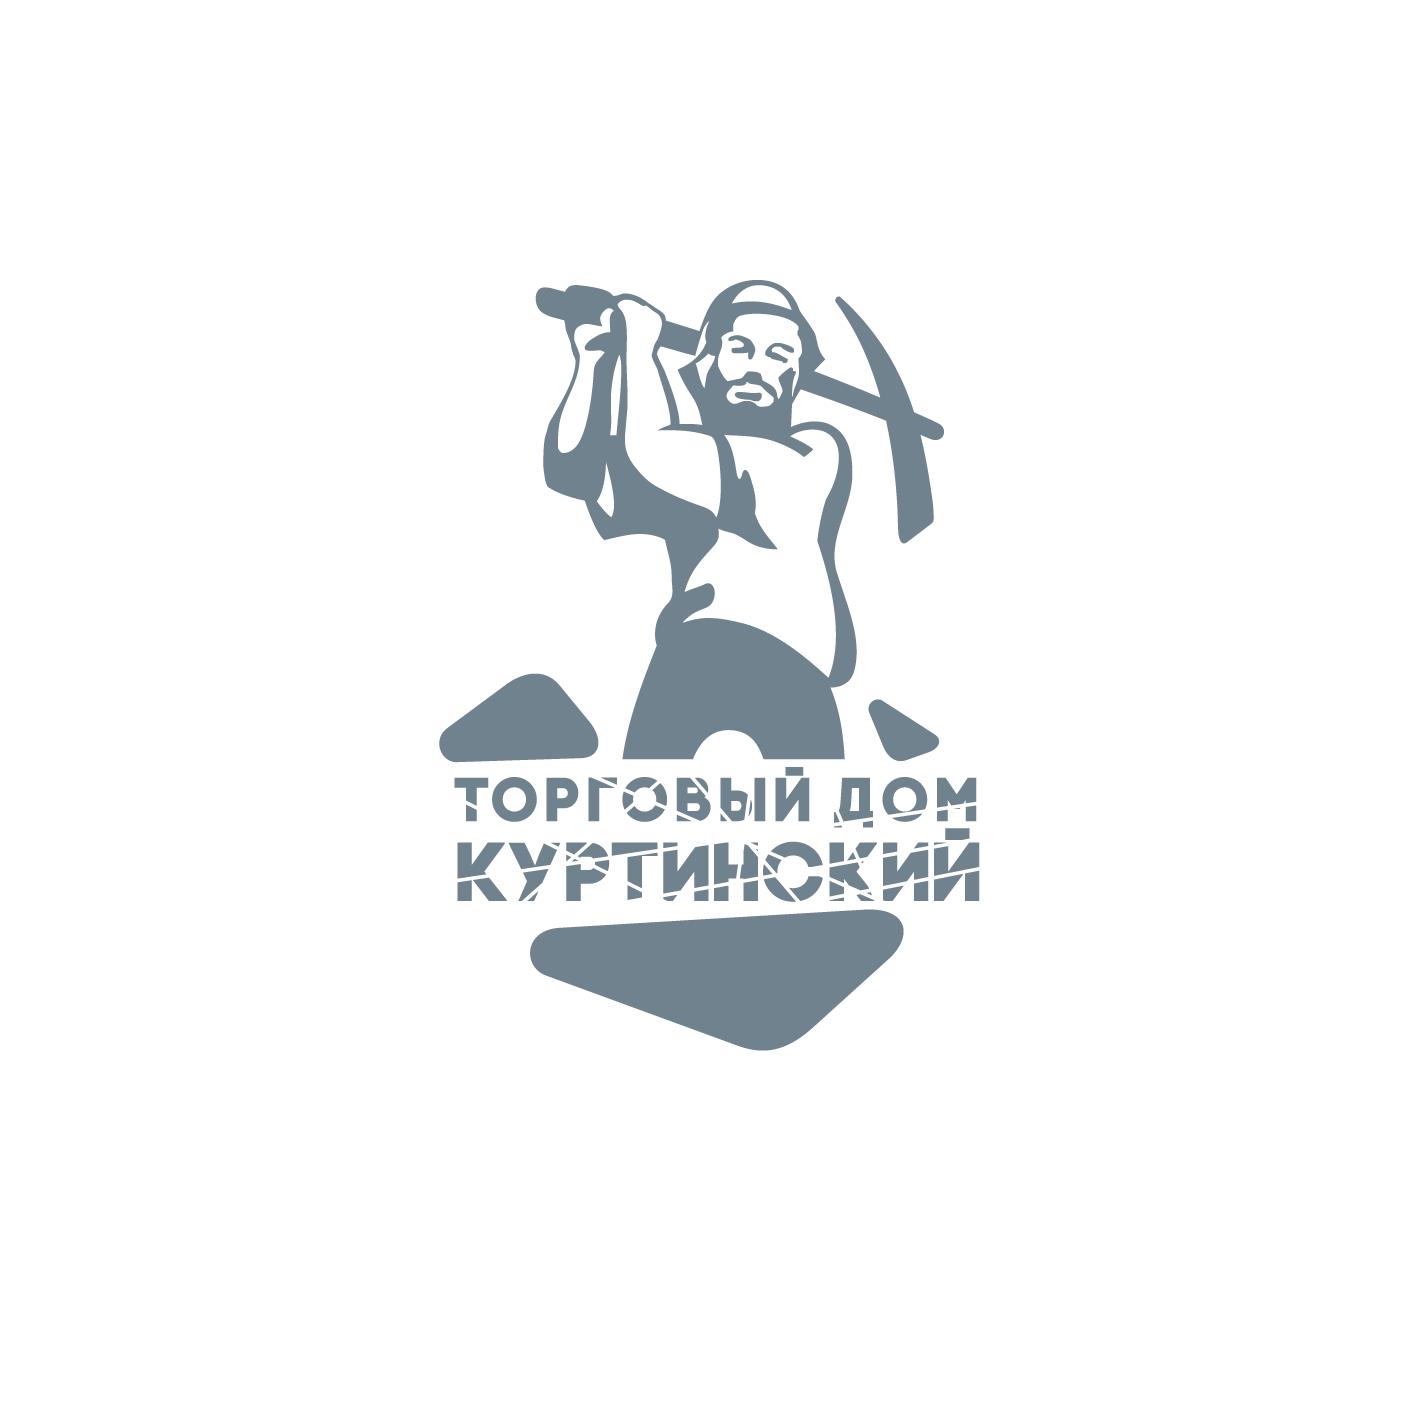 Логотип для камнедобывающей компании фото f_0735b995b7f9481c.png